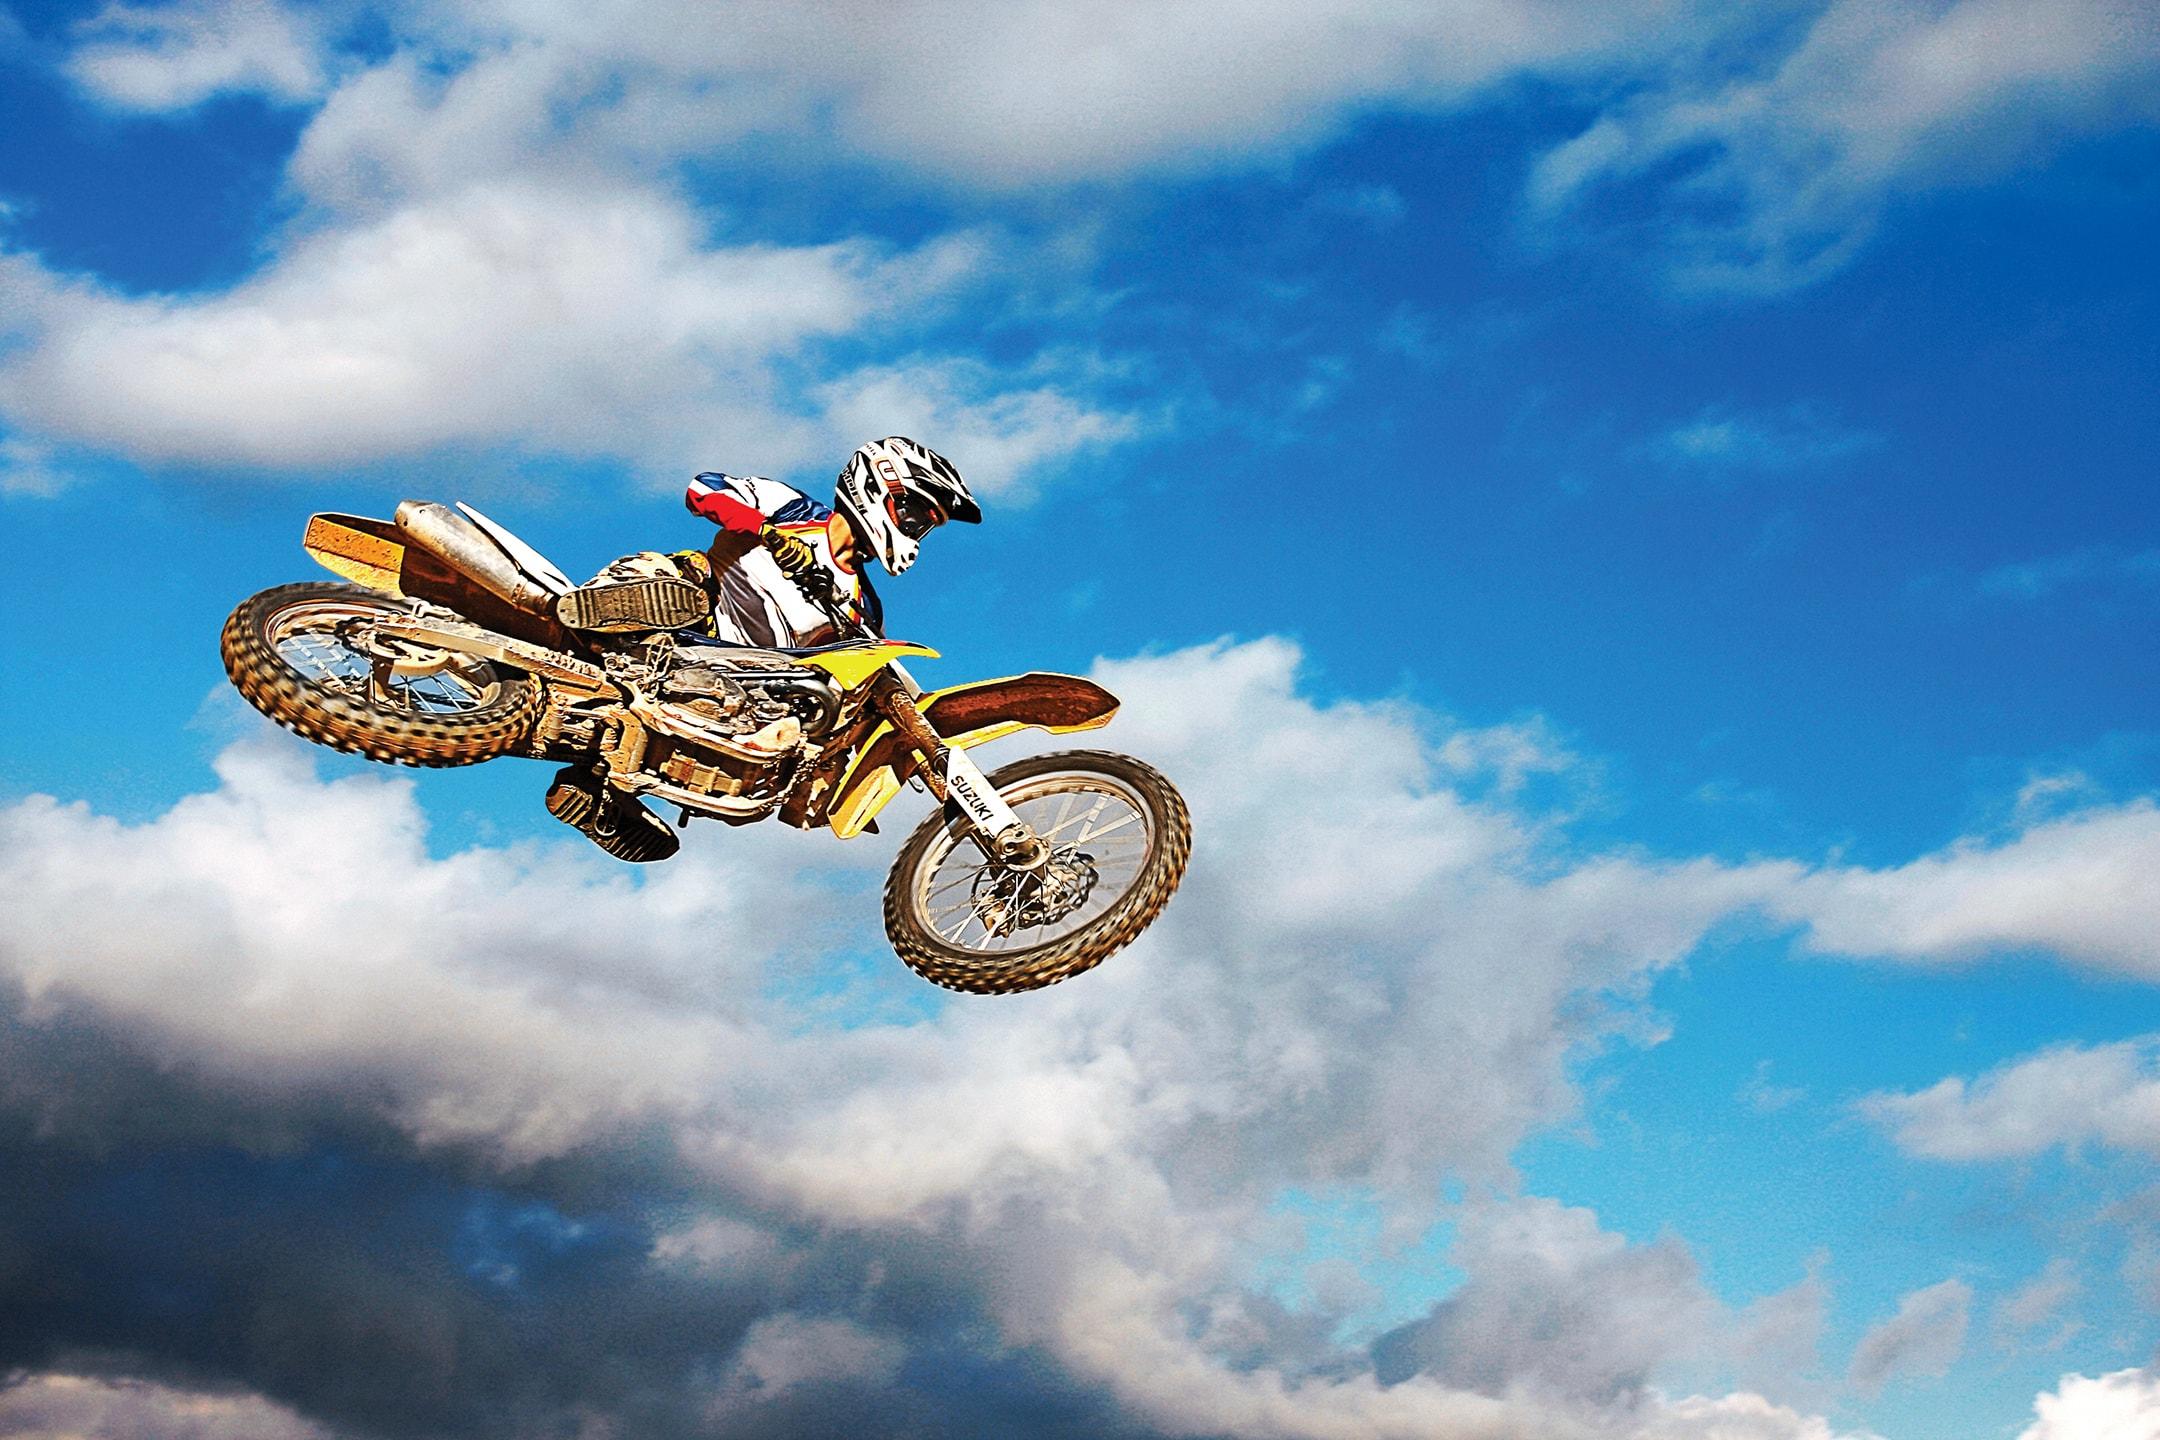 dirt-bike-sports-photography-miami-marcel-boldu.jpg